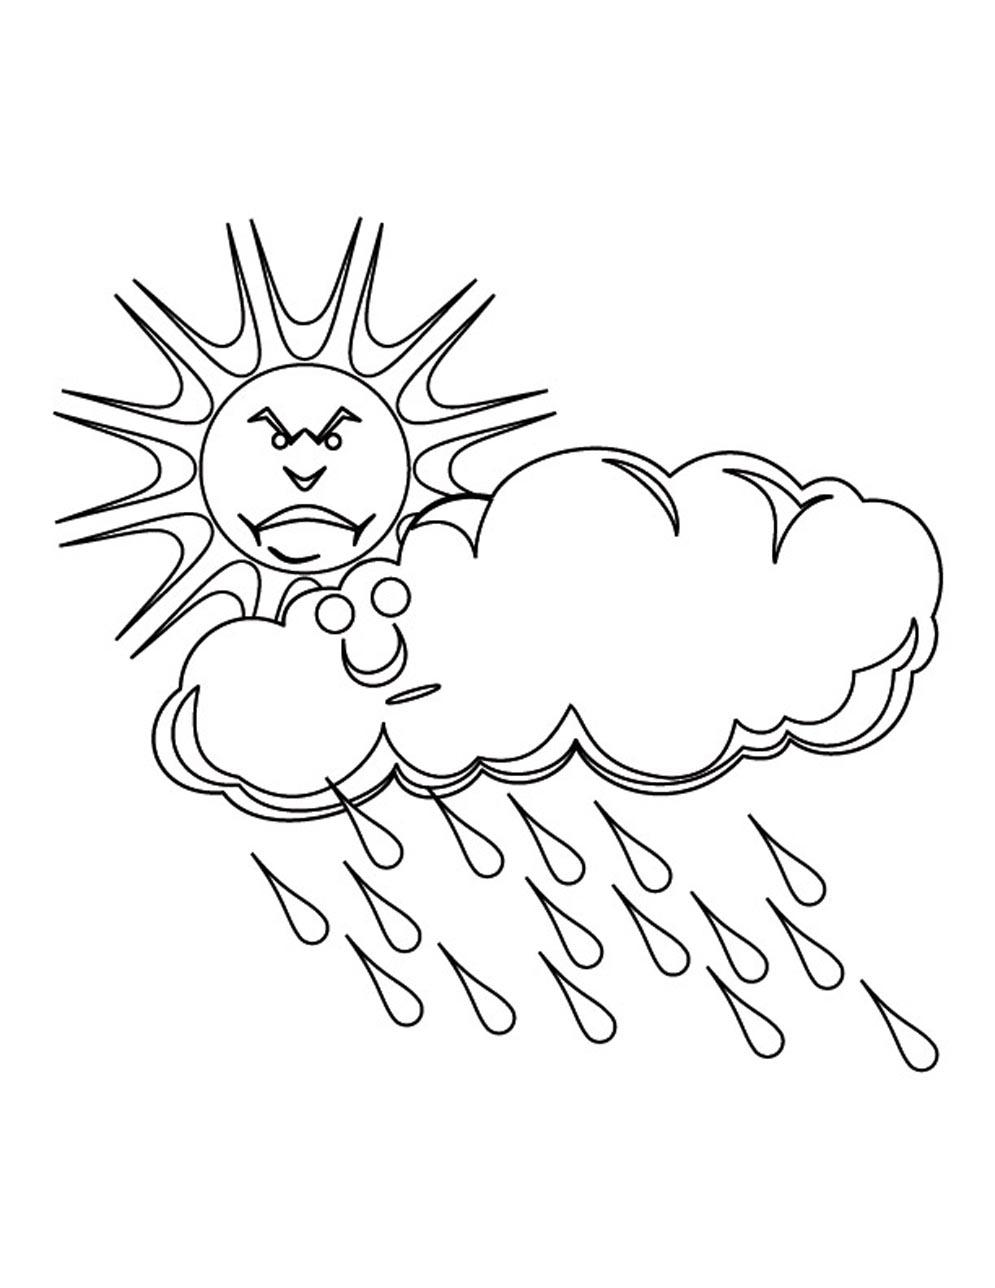 Rain Cloud Drawing at GetDrawings.com | Free for personal use Rain ...